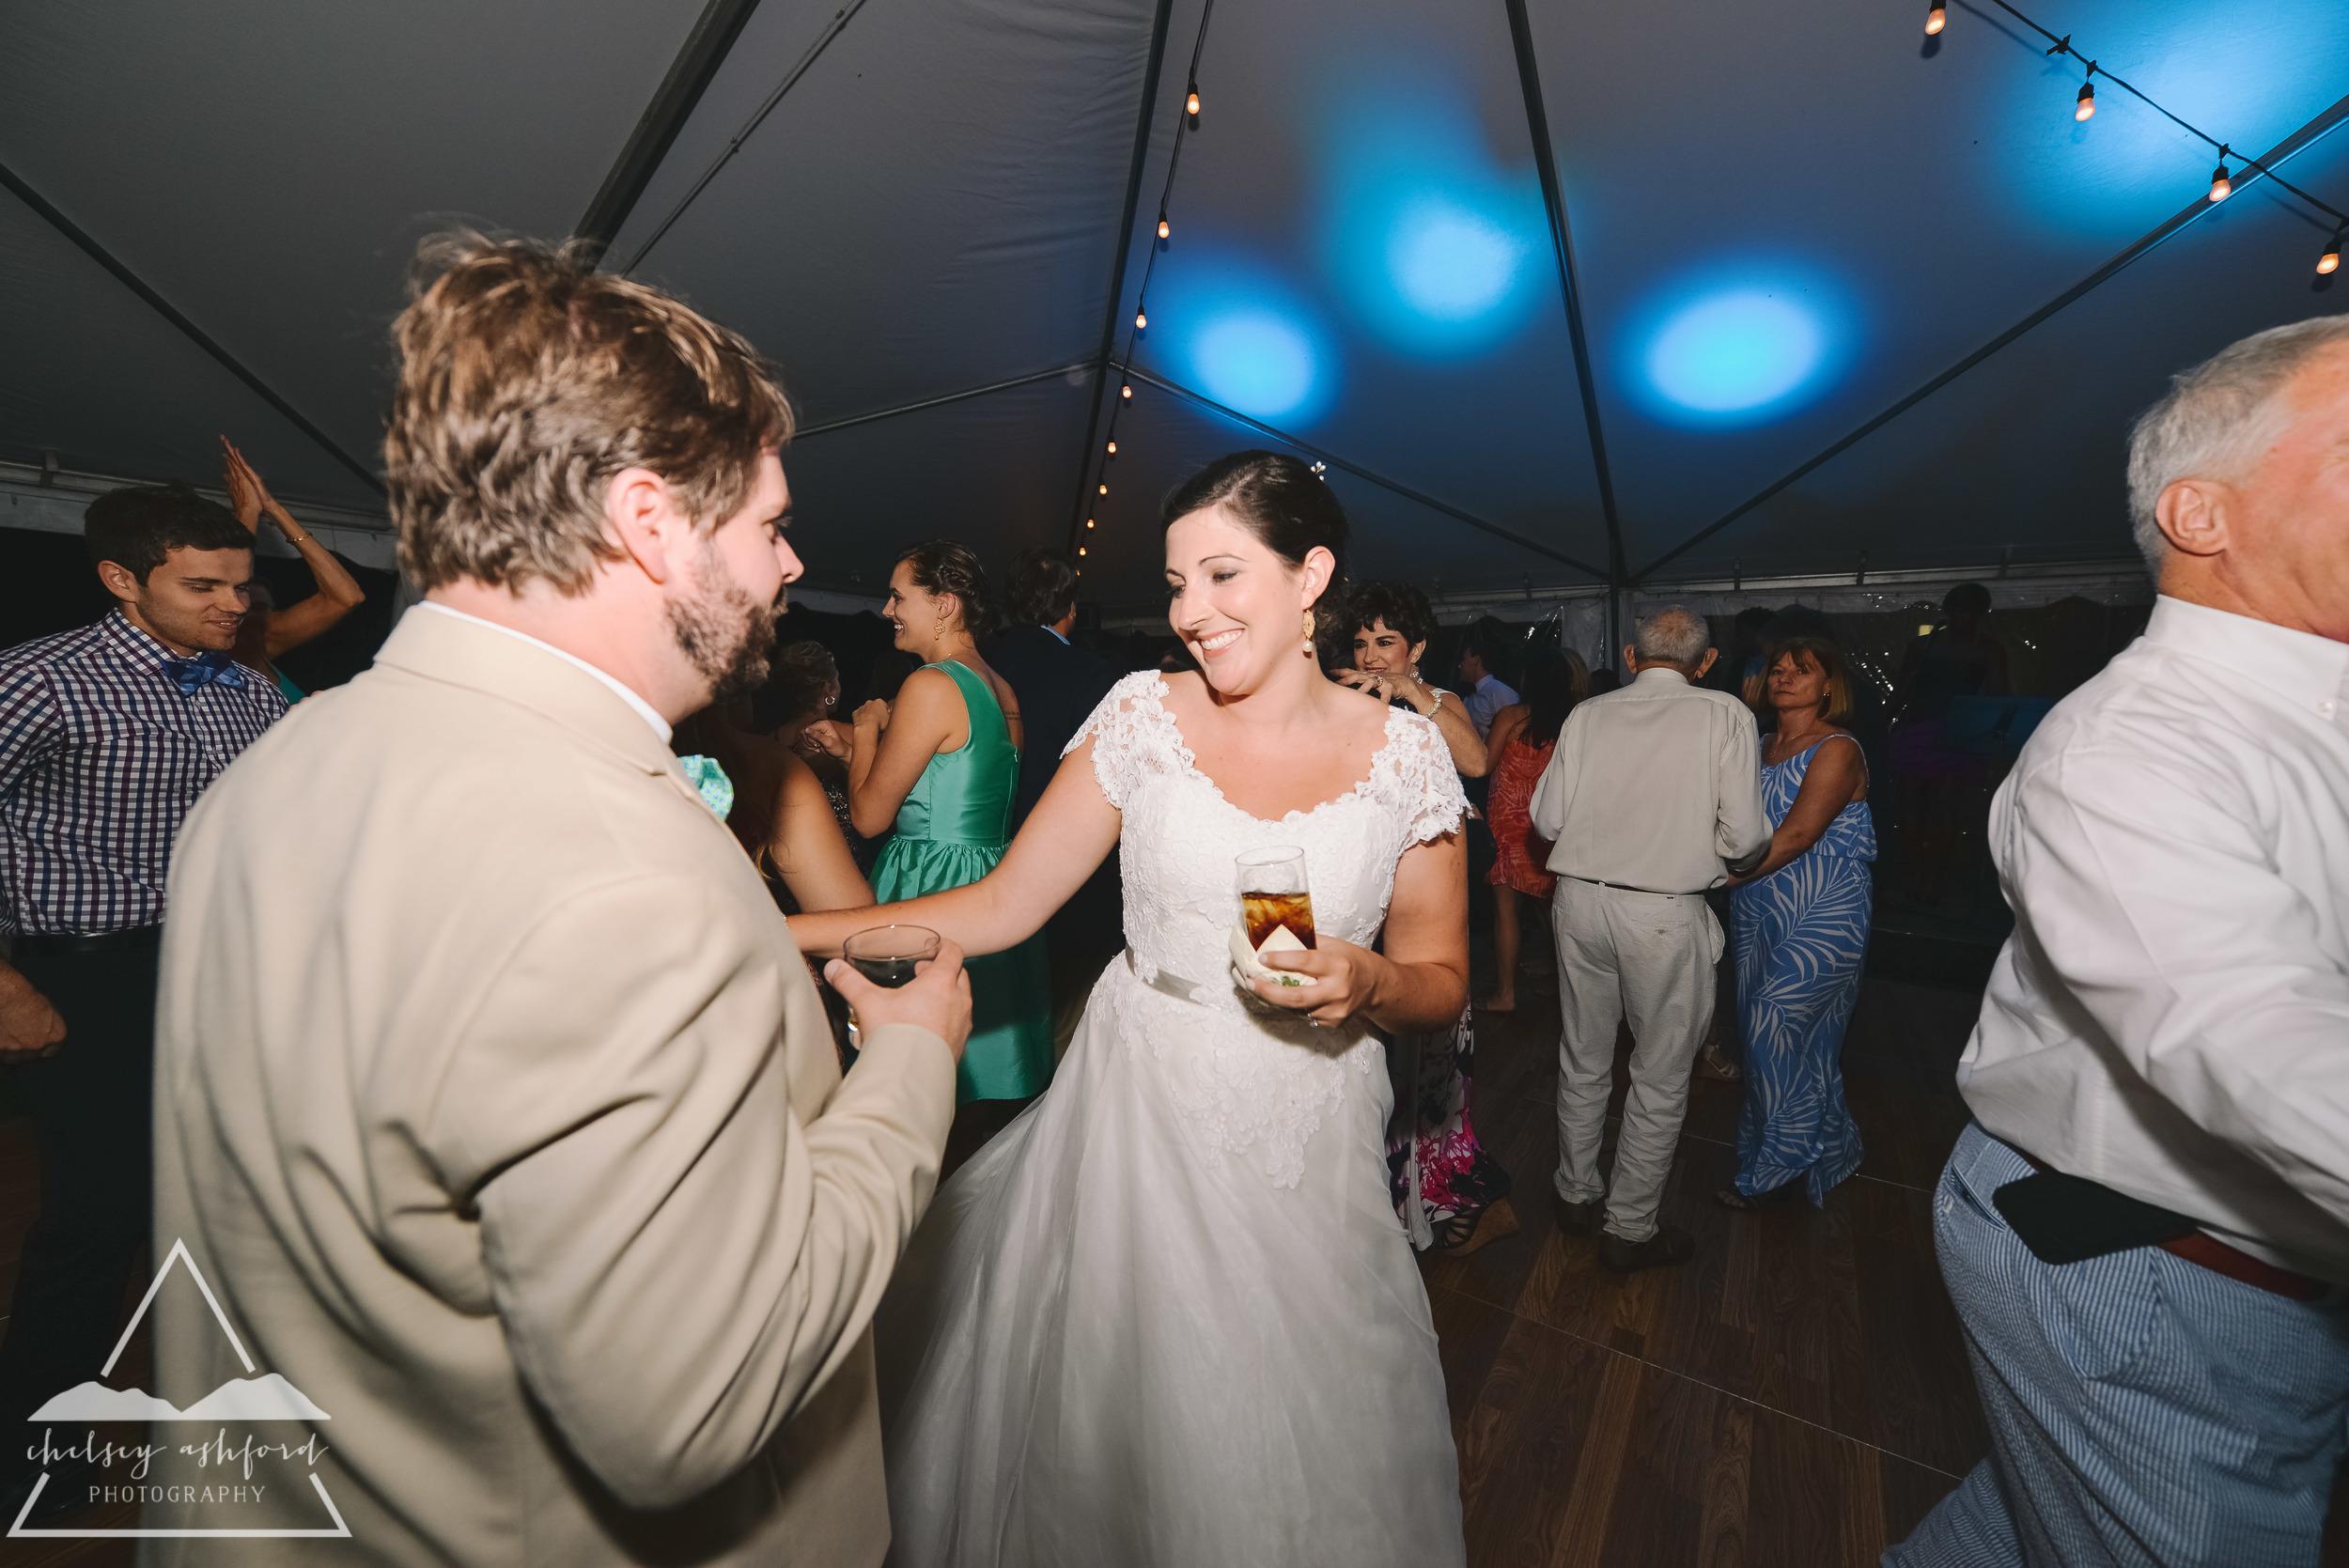 Clarkson_wedding_web-191.jpg